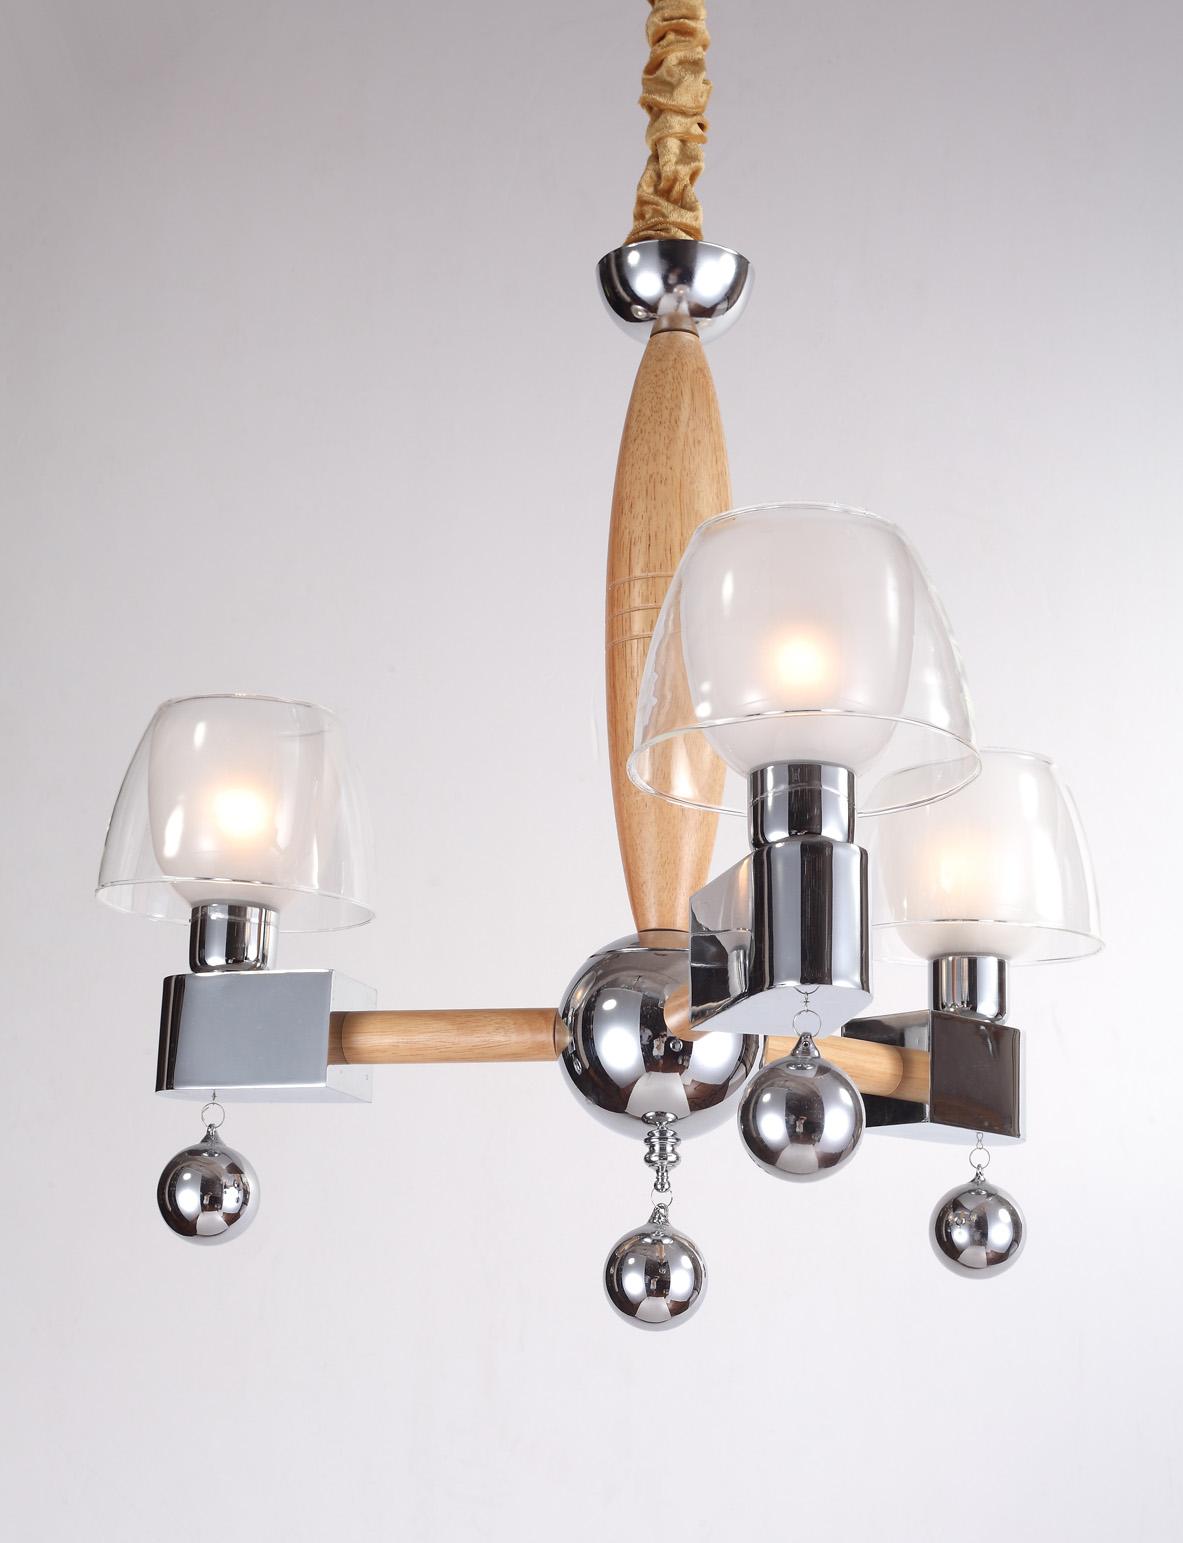 Подвесной светильник NaturaПодвесные светильники<br>&amp;lt;div&amp;gt;Вид цоколя: E14&amp;lt;/div&amp;gt;&amp;lt;div&amp;gt;Мощность: &amp;amp;nbsp;60W&amp;amp;nbsp;&amp;lt;/div&amp;gt;&amp;lt;div&amp;gt;Количество ламп: 3&amp;lt;/div&amp;gt;<br><br>Material: Дерево<br>Height см: 89<br>Diameter см: 50